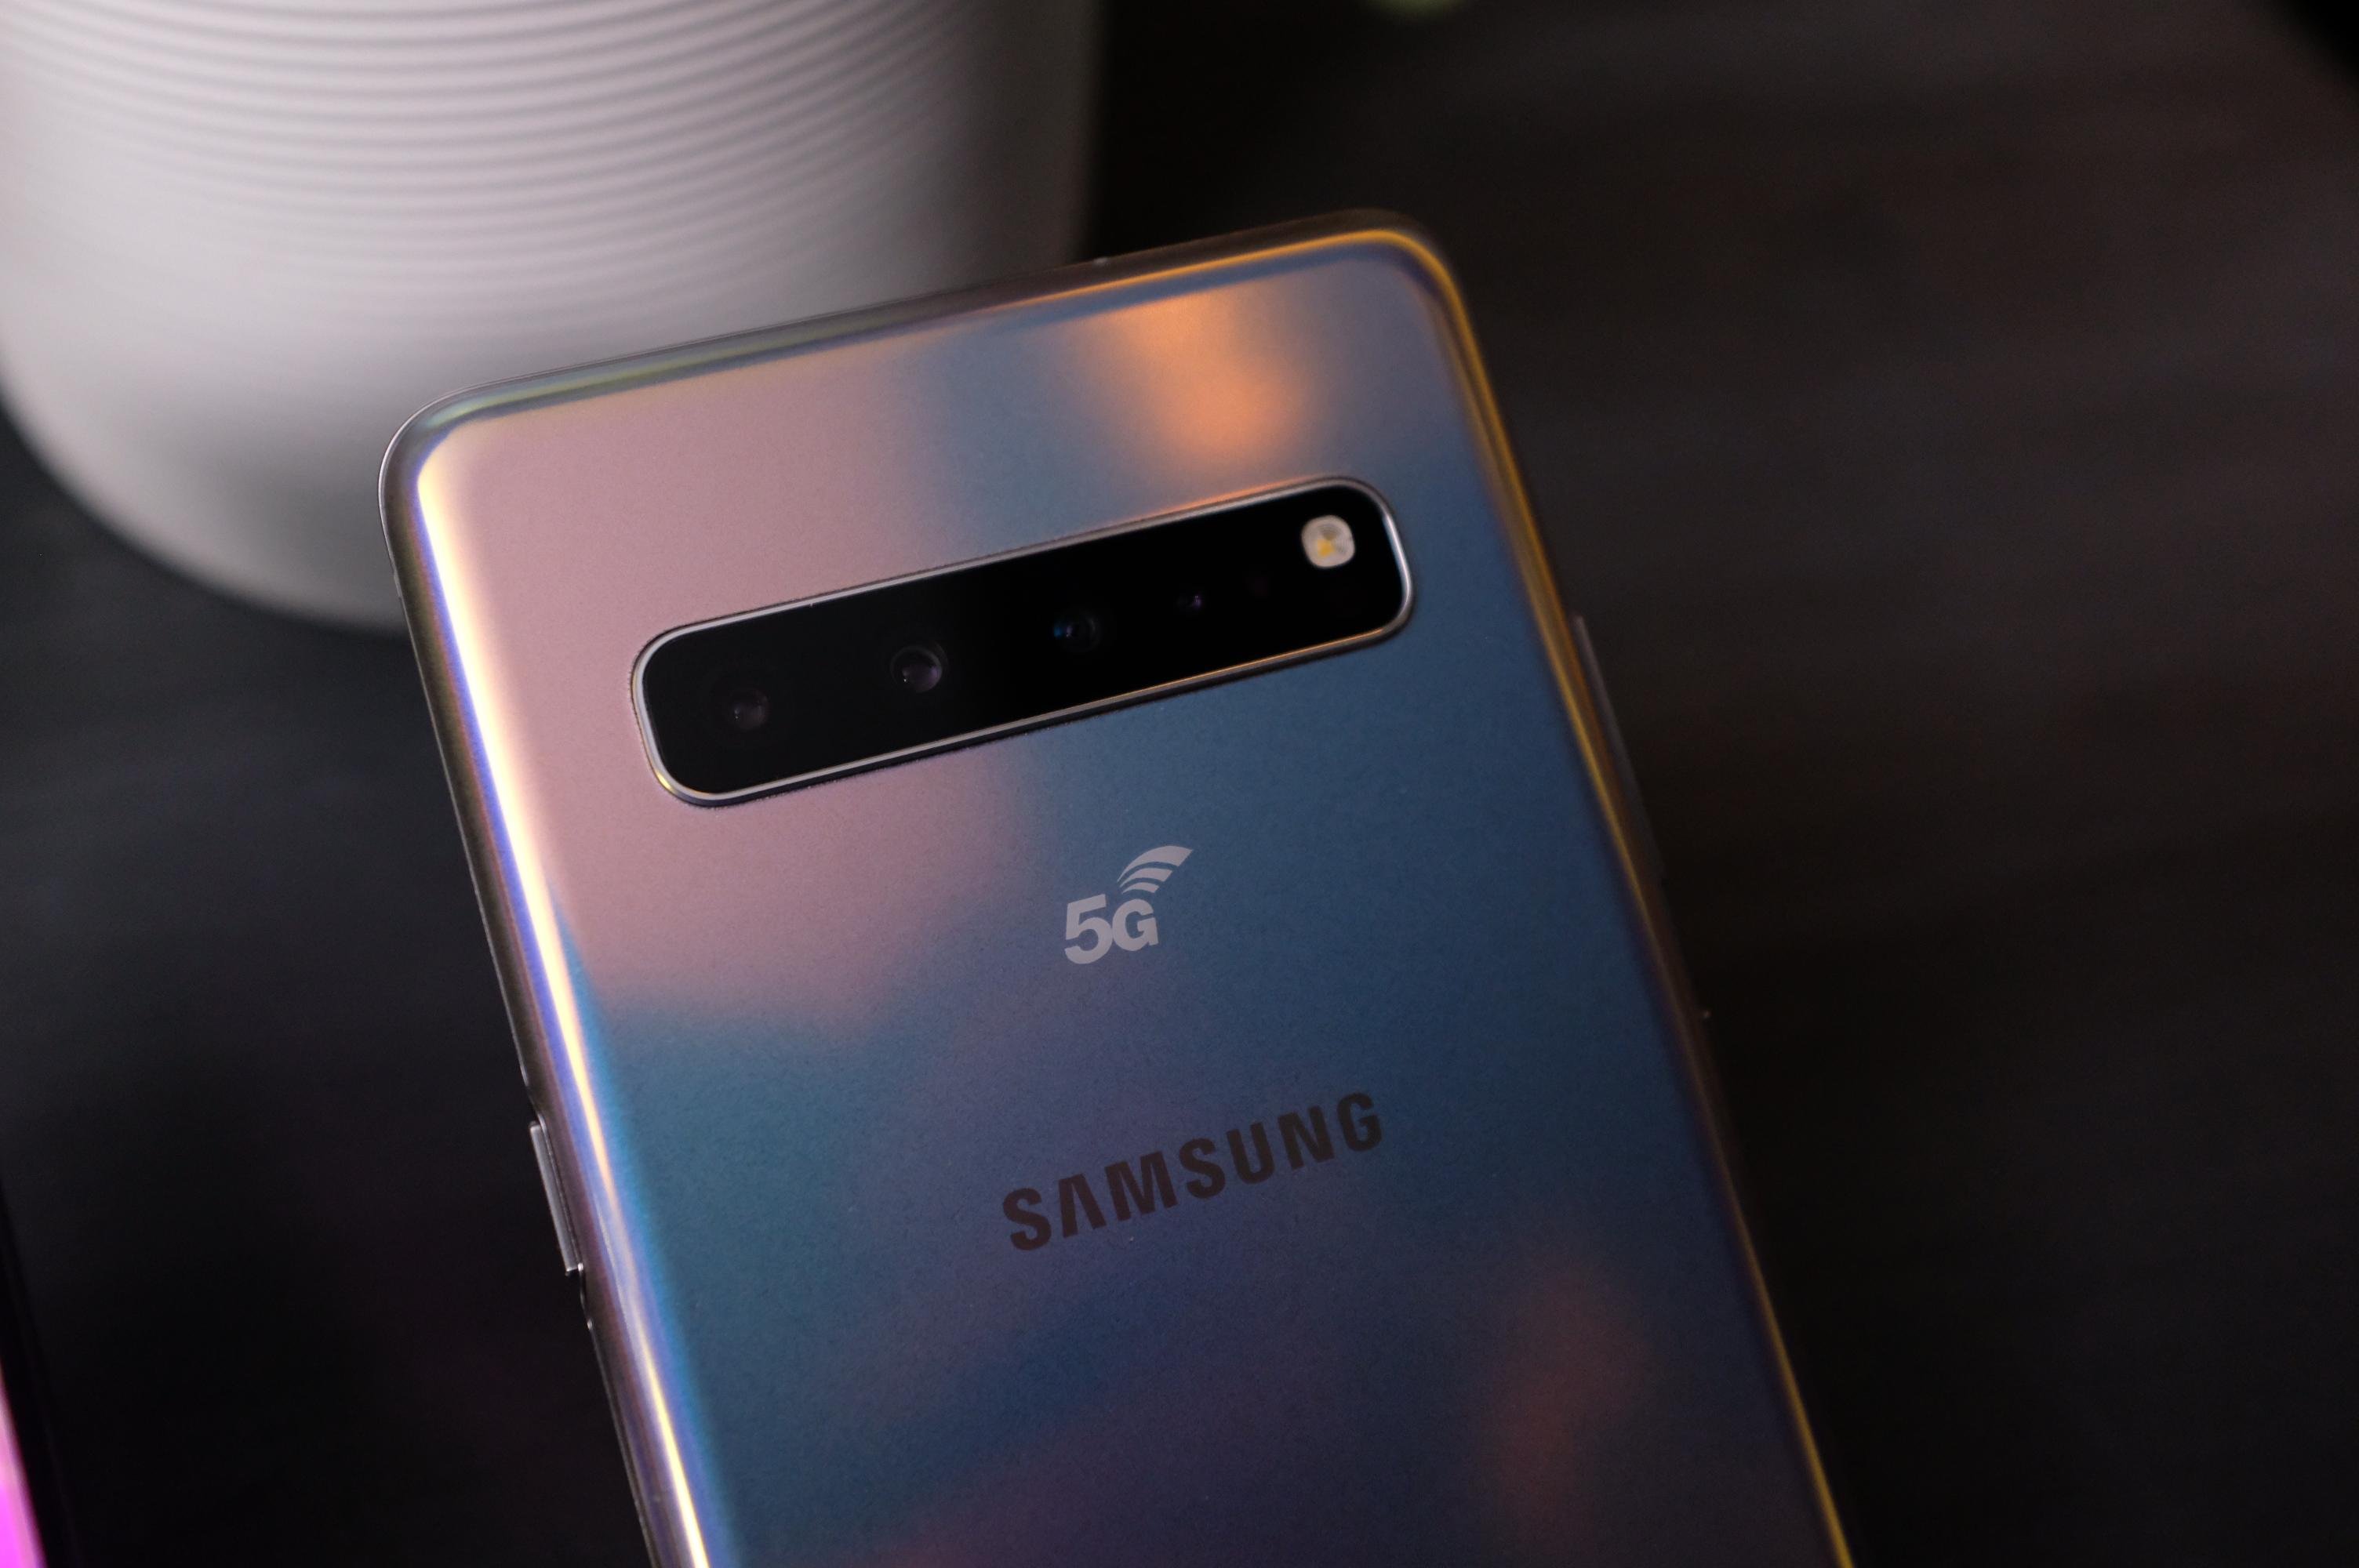 5g mobile phone price in india 2020